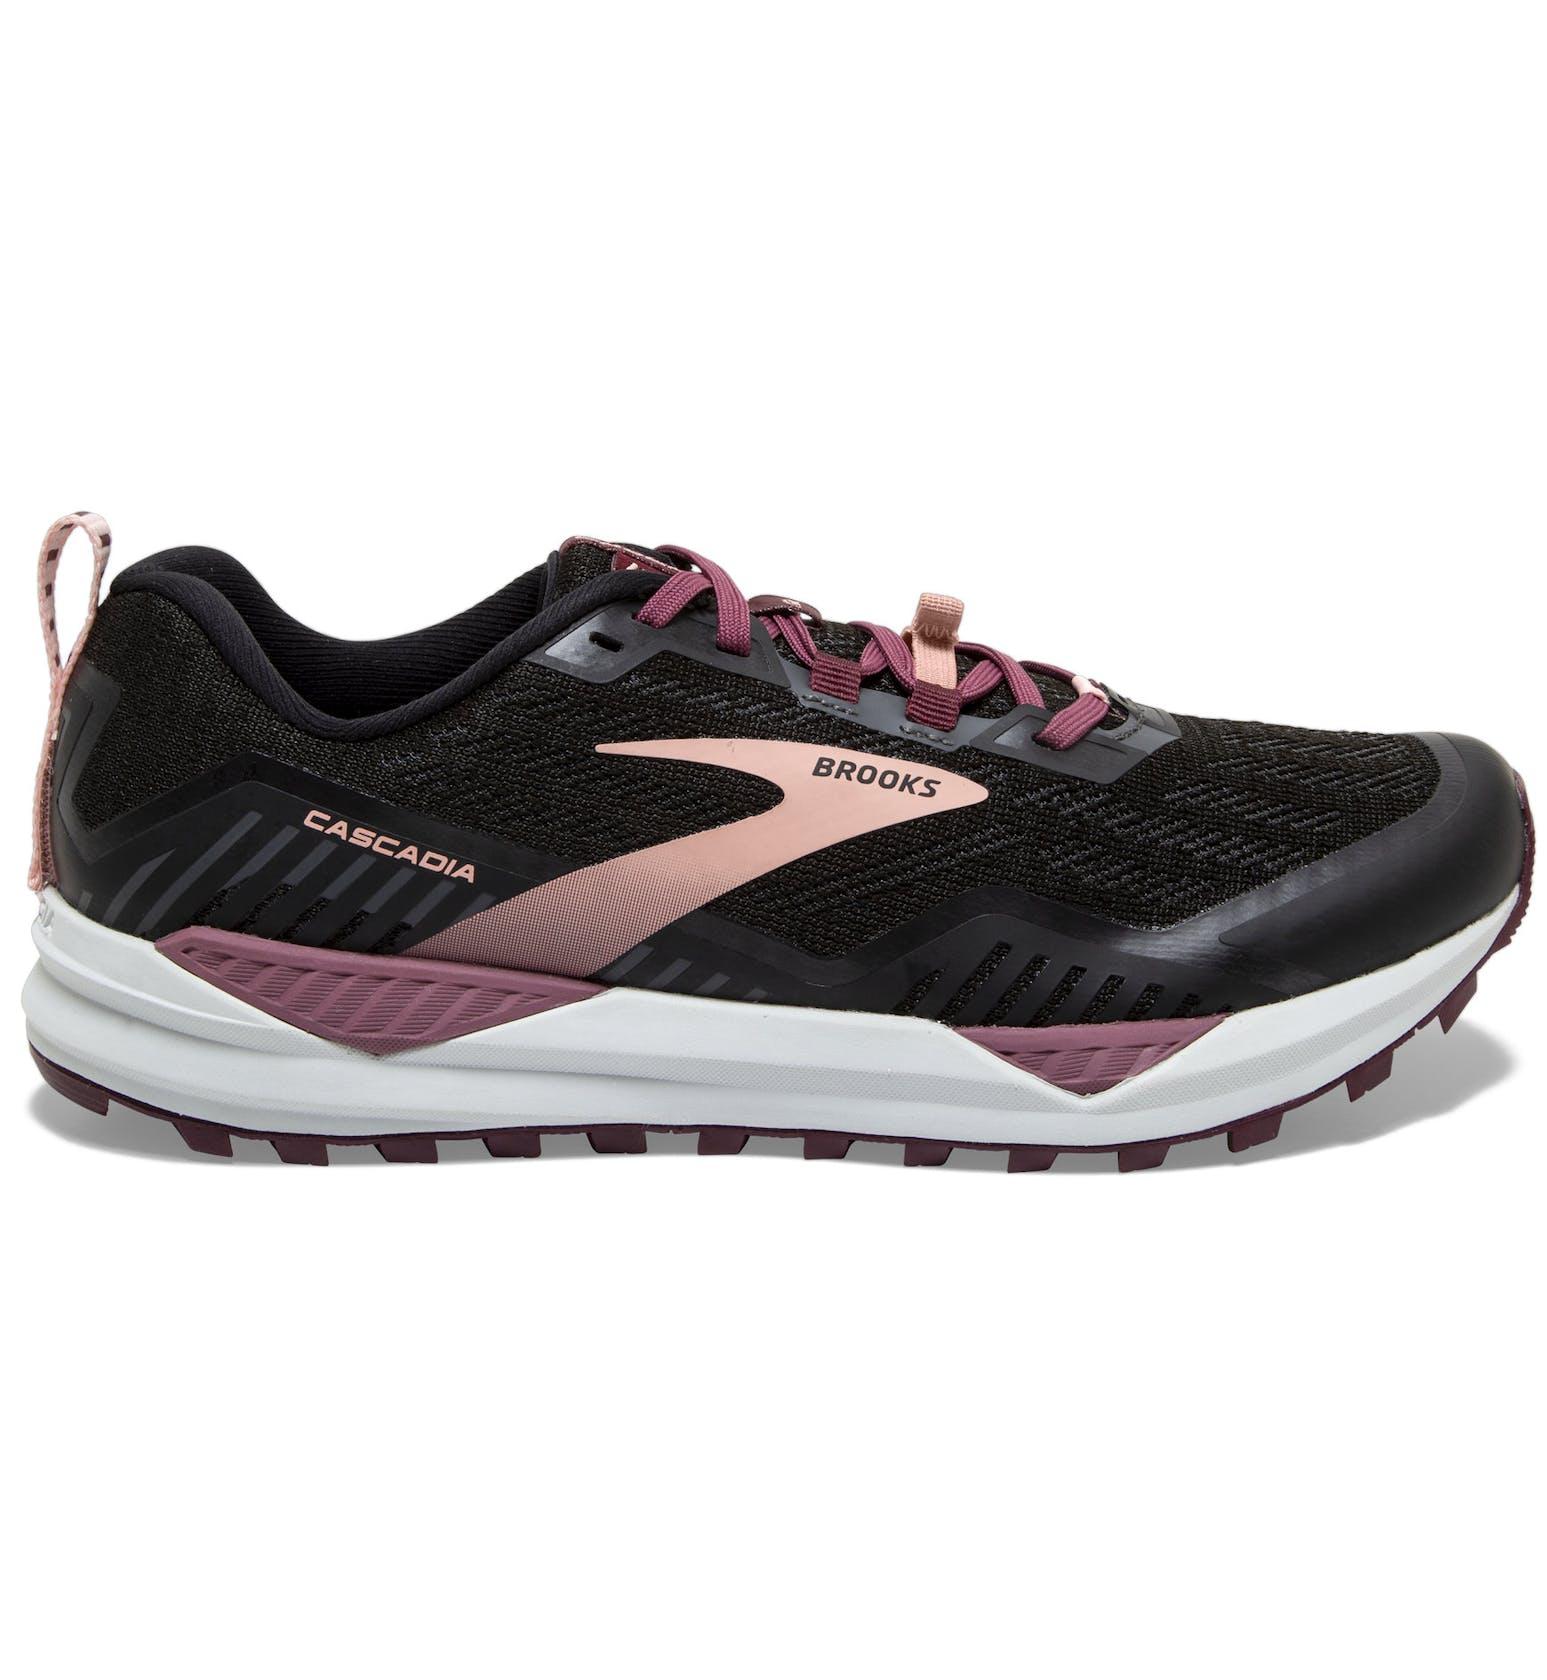 Brooks Cascadia 15 - scarpe trail running - donna